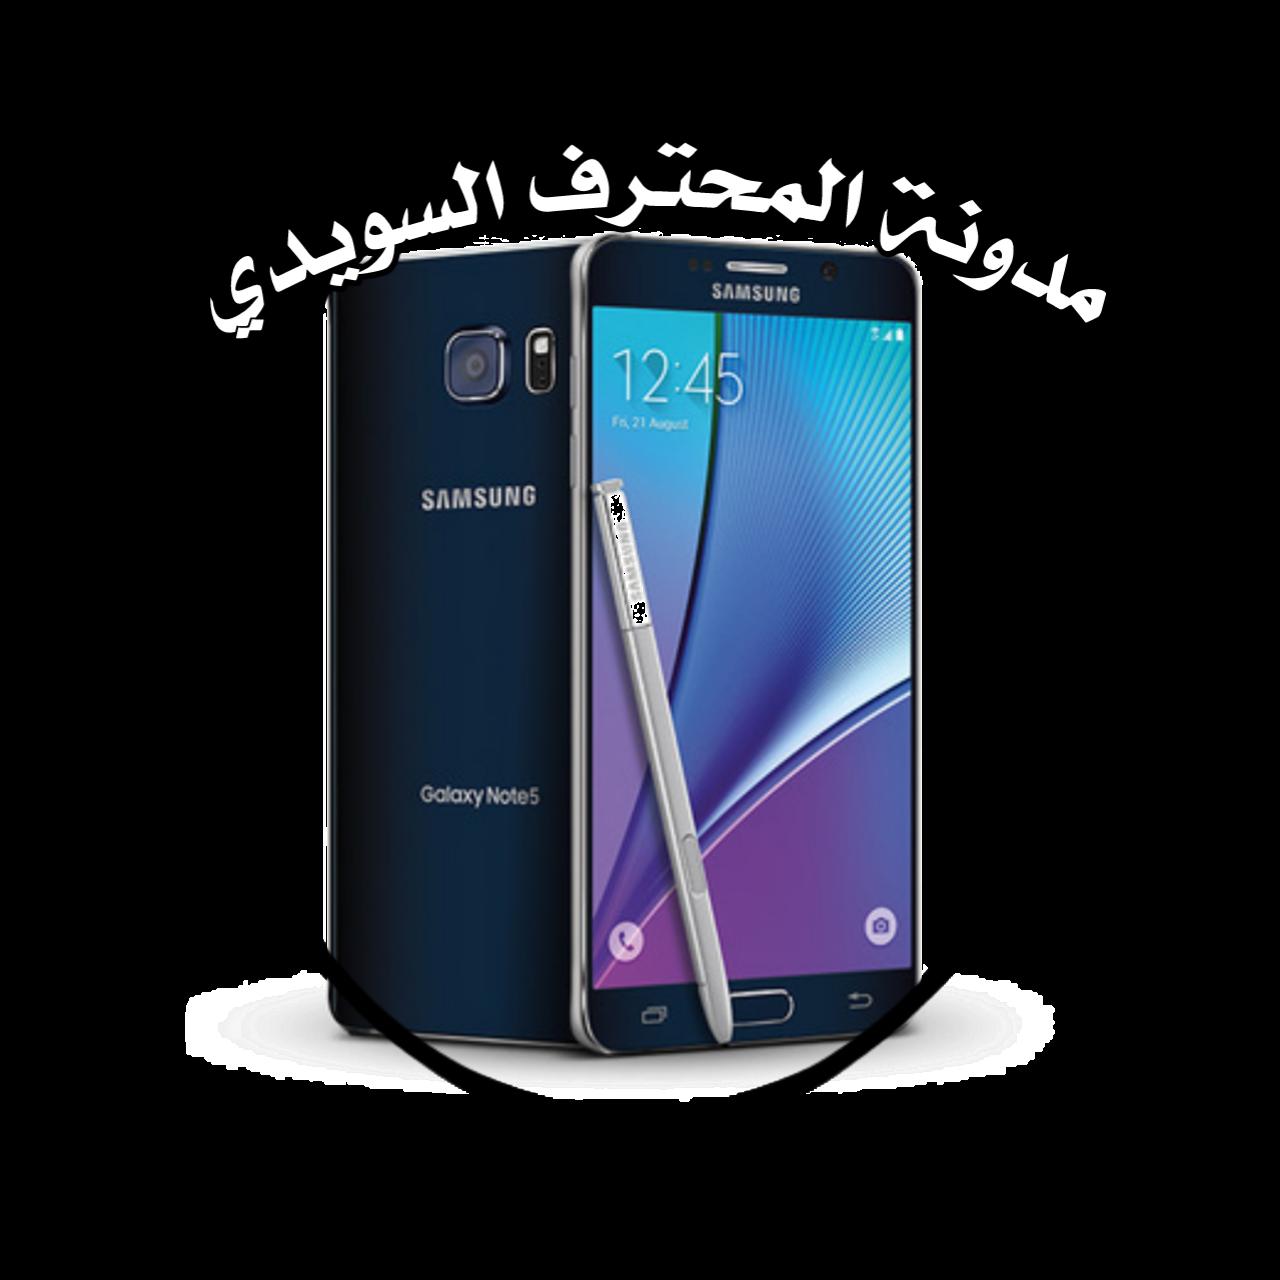 روم جهاز نوت 5 سبرنت  SAMSUNG GALAXY NOTE 5 N920P SPRIN